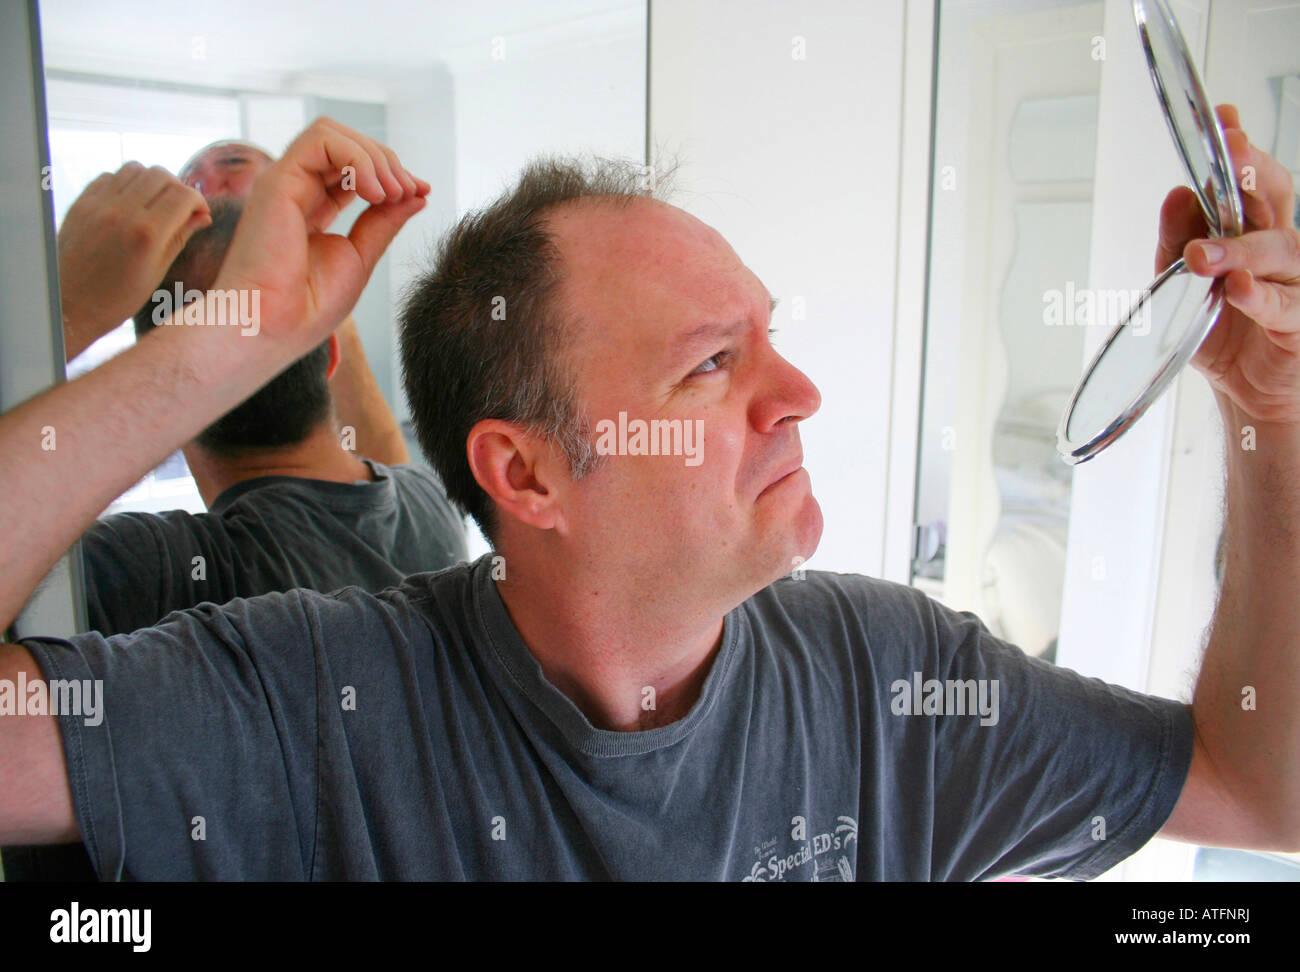 man-checking-his-thinning-hair-ATFNRJ.jp